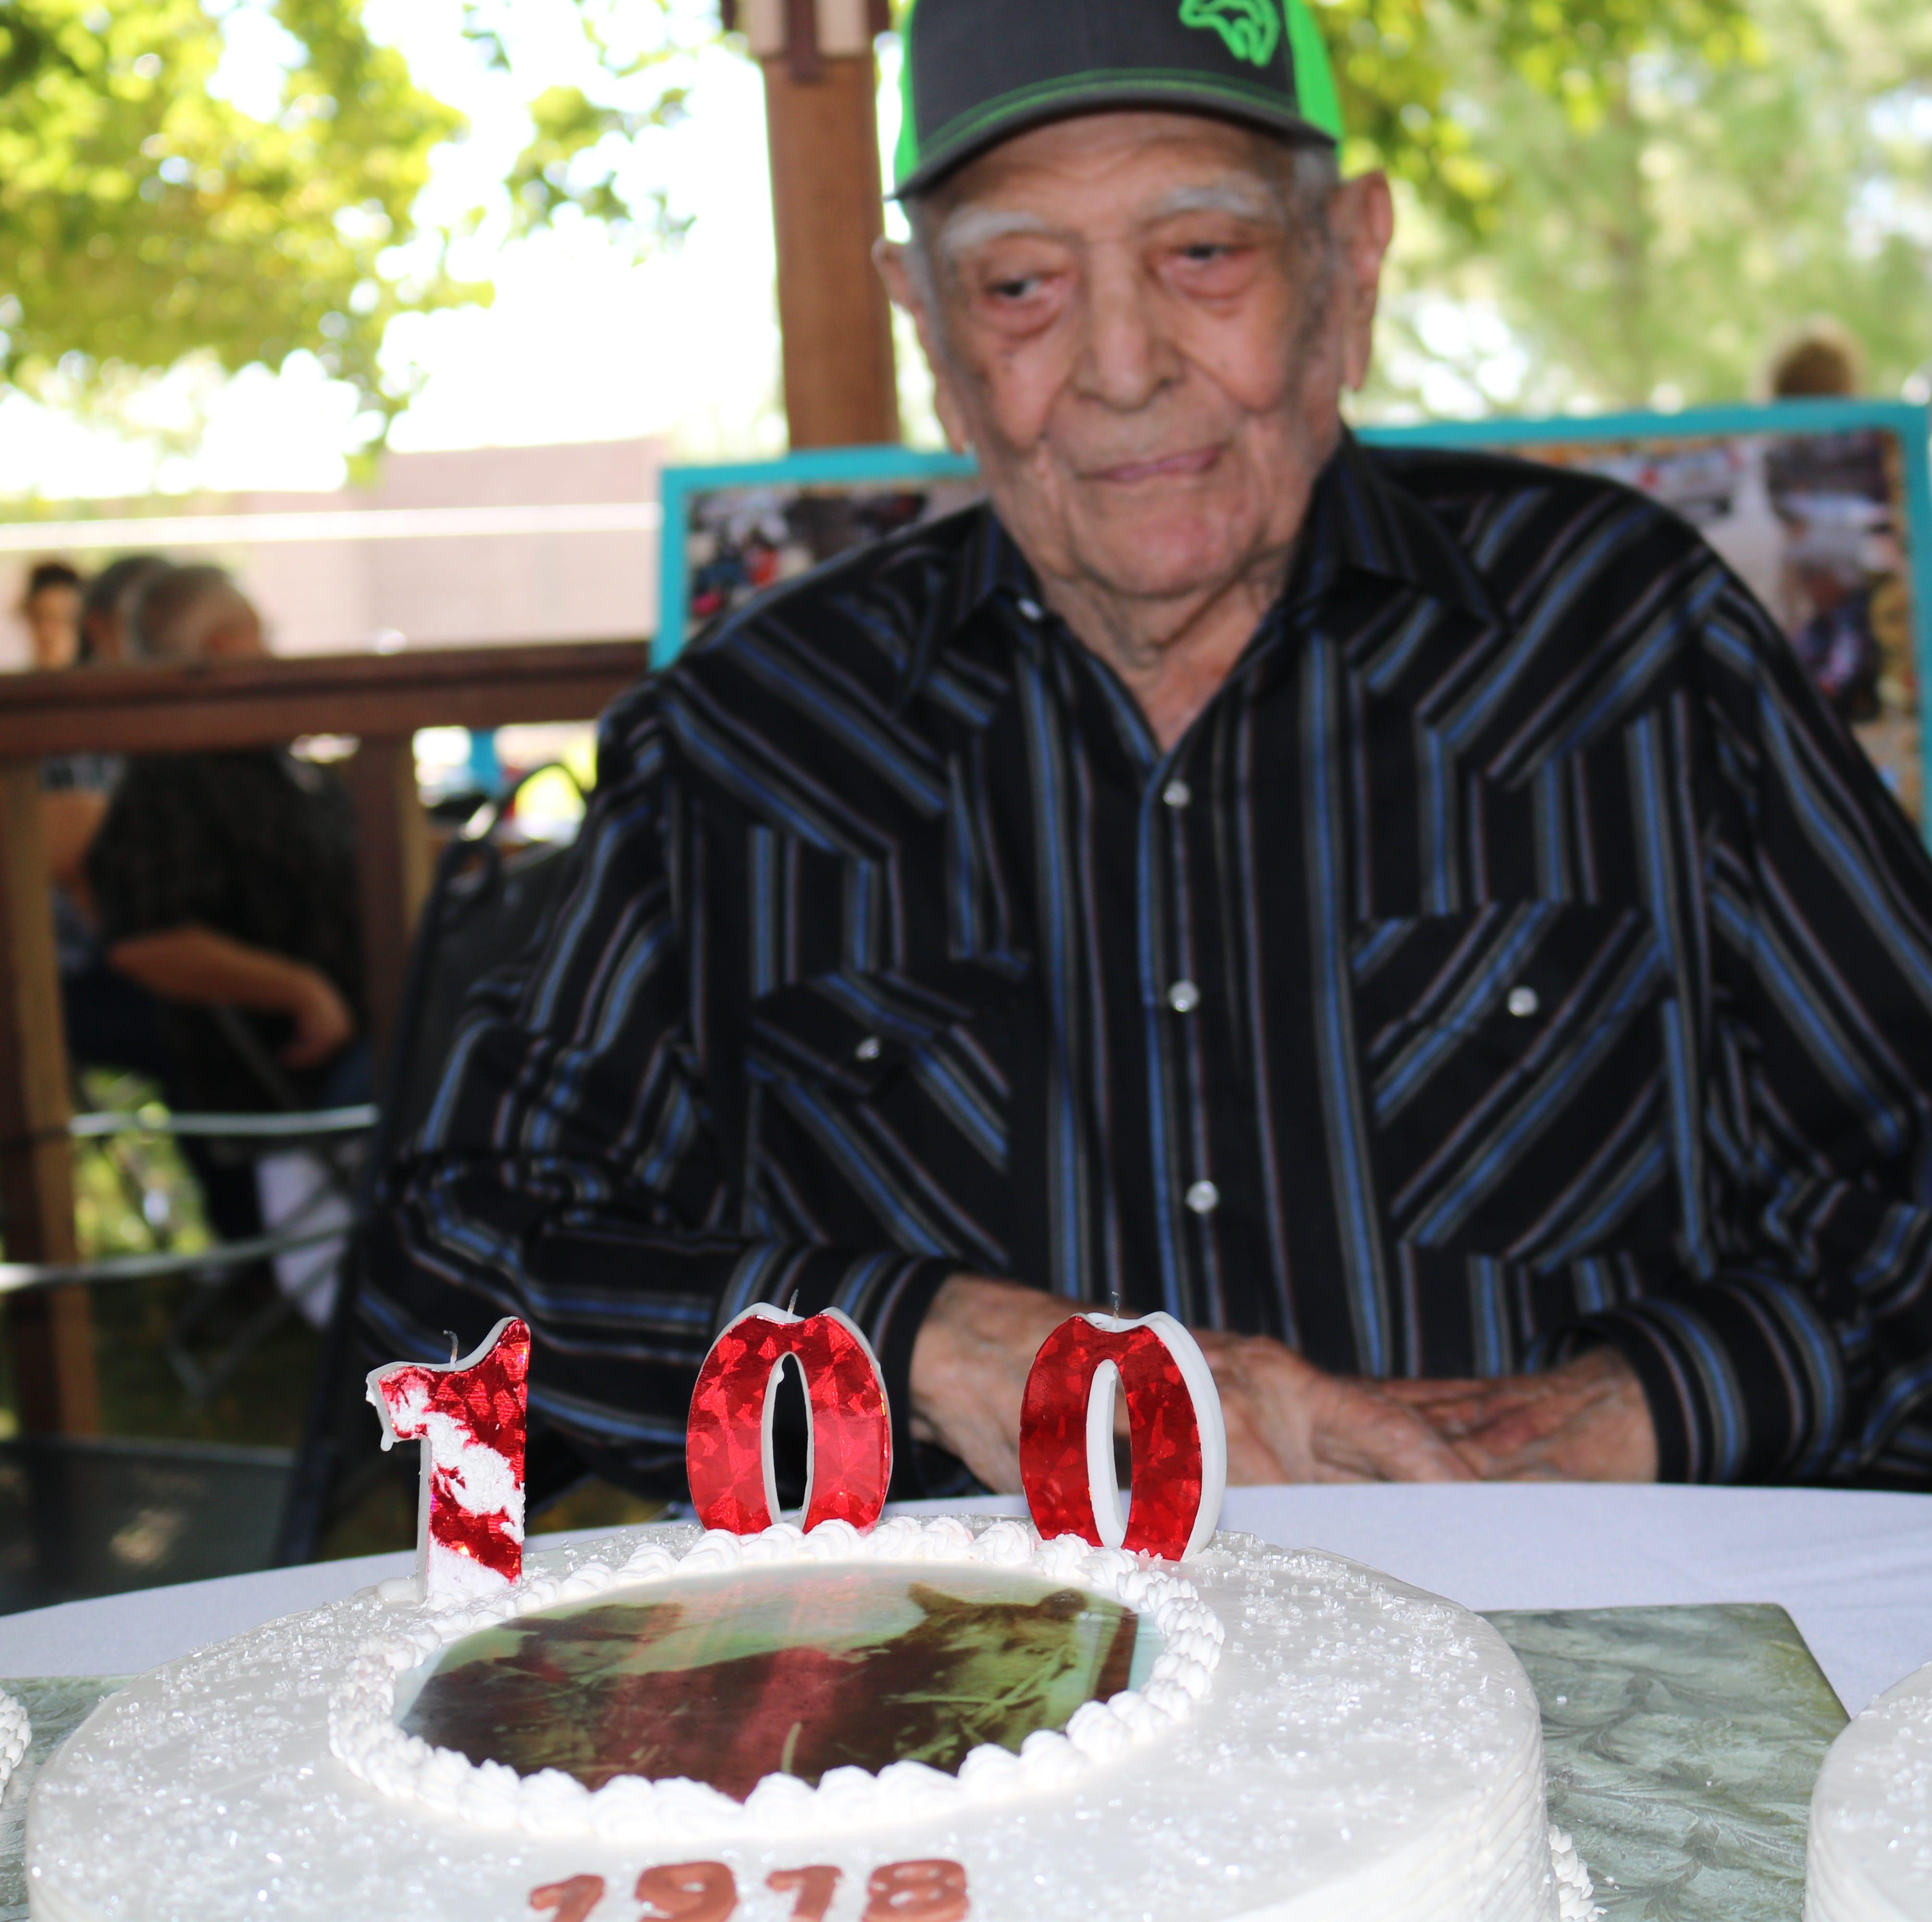 Las Cruces man celebrates 100th birthday